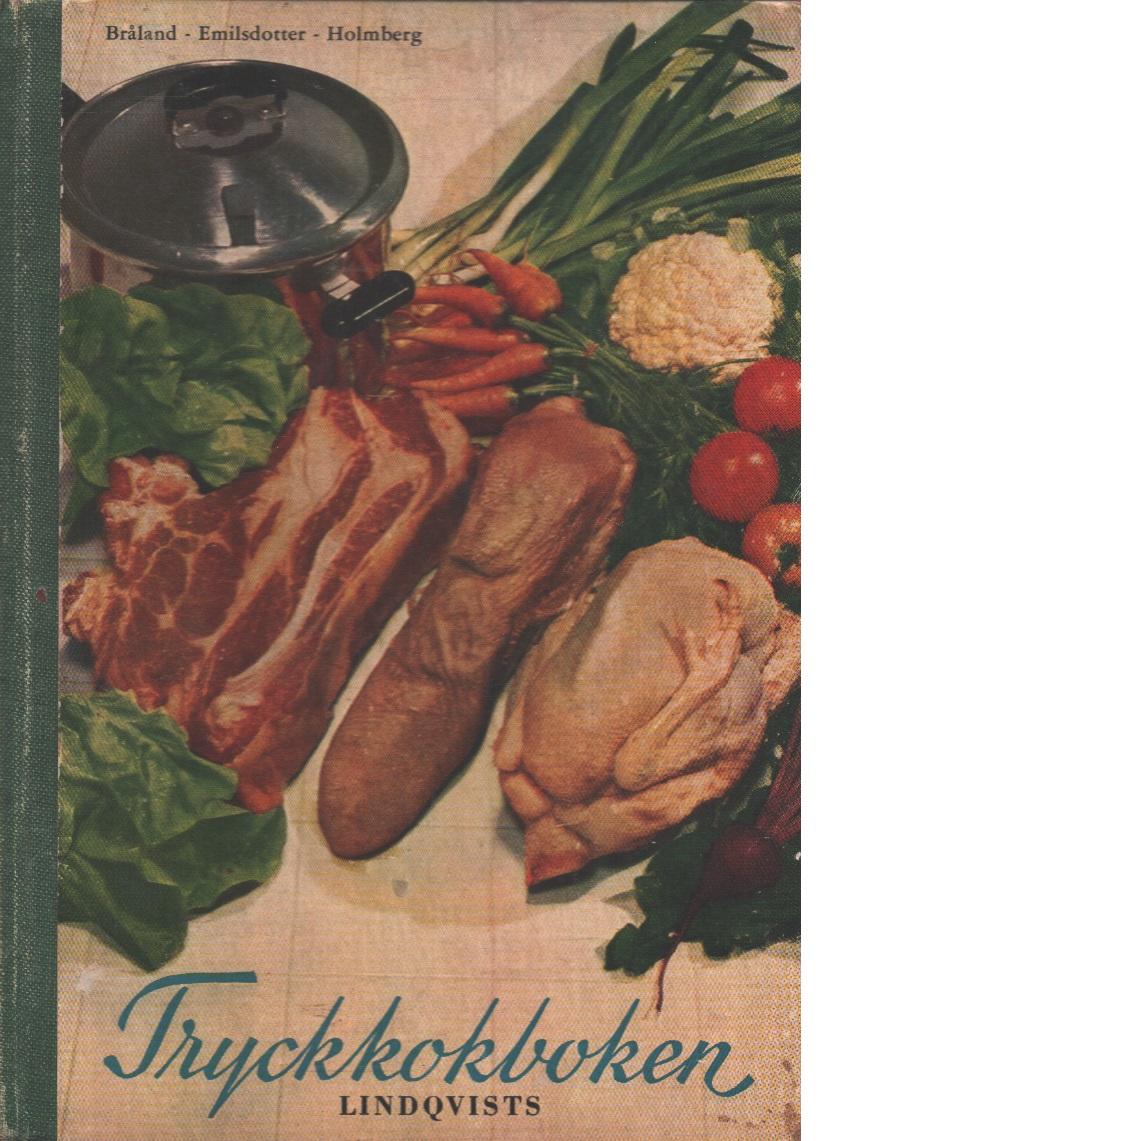 Tryckkokboken - Bråland, Ingrid